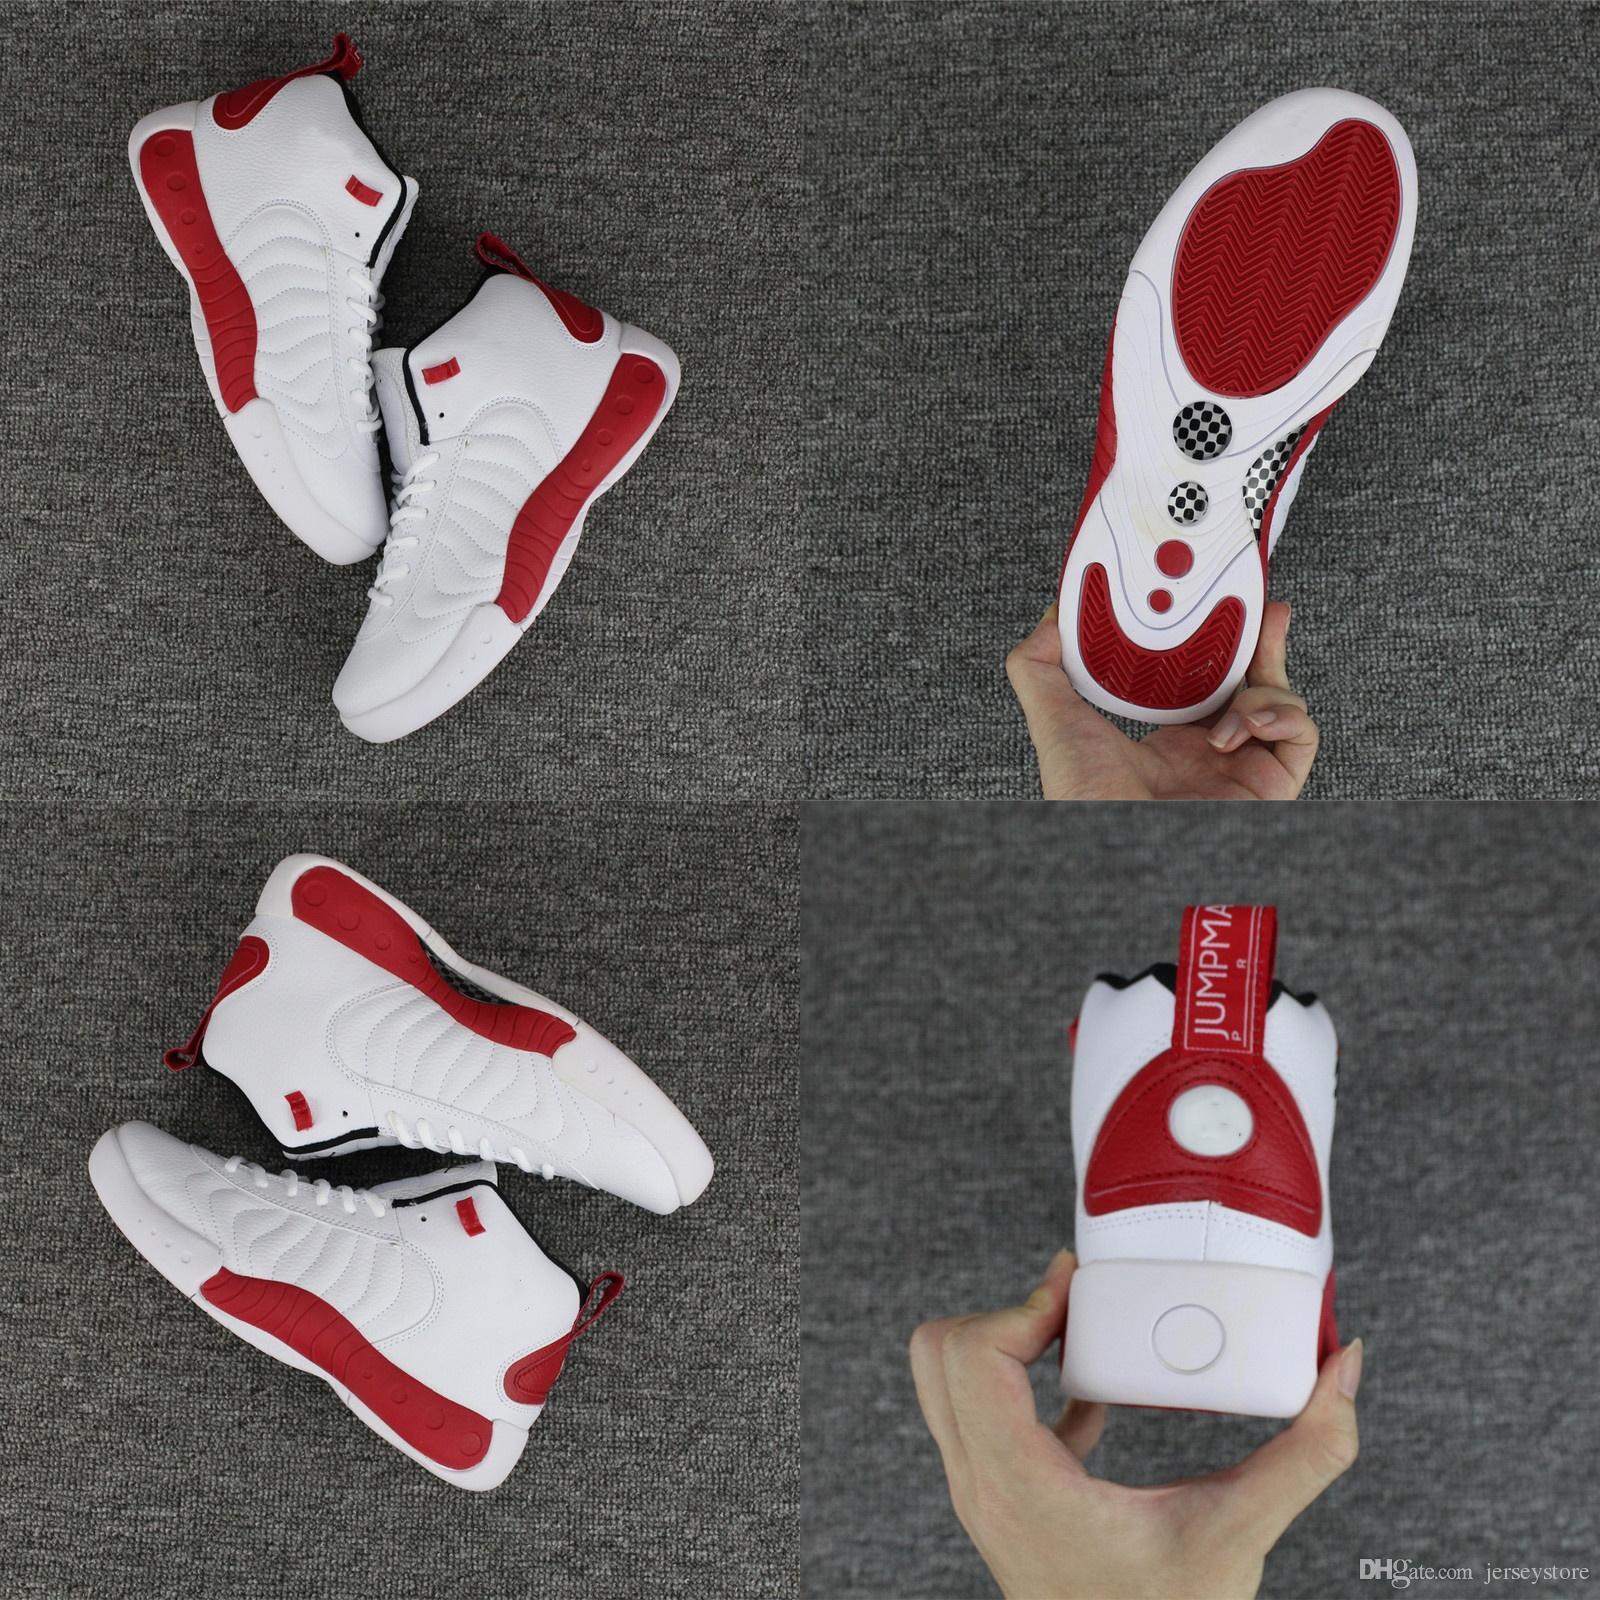 Acheter Top Qualité Jumpman Pro Og Hommes Basketball Chaussures Totvtqfi-000422-2554456 Chaussures De Marque